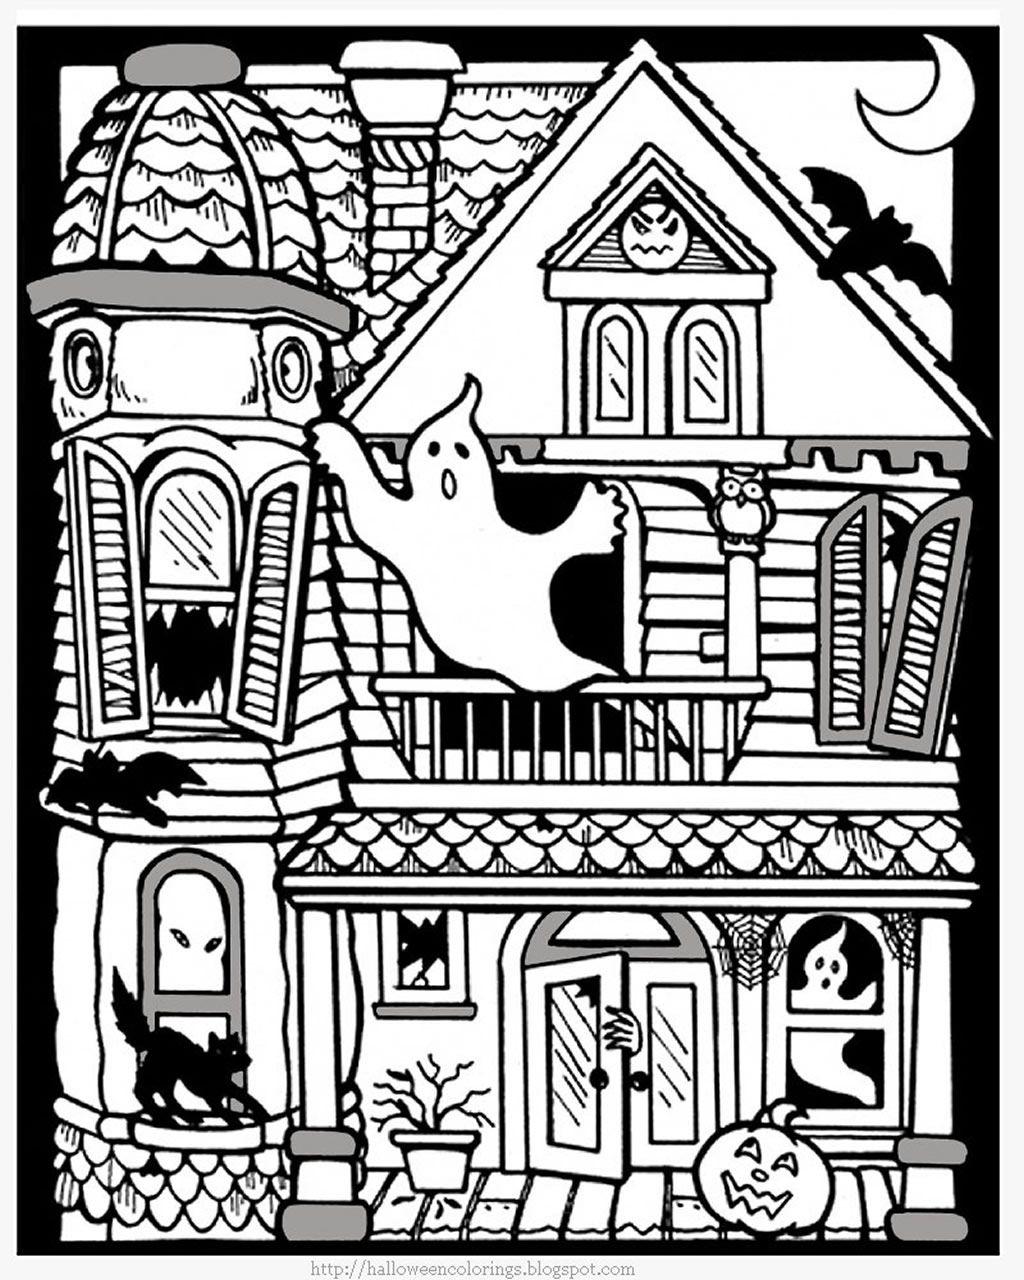 Colour Me In - Haunted House   Celebrations   Pinterest   Celebrations